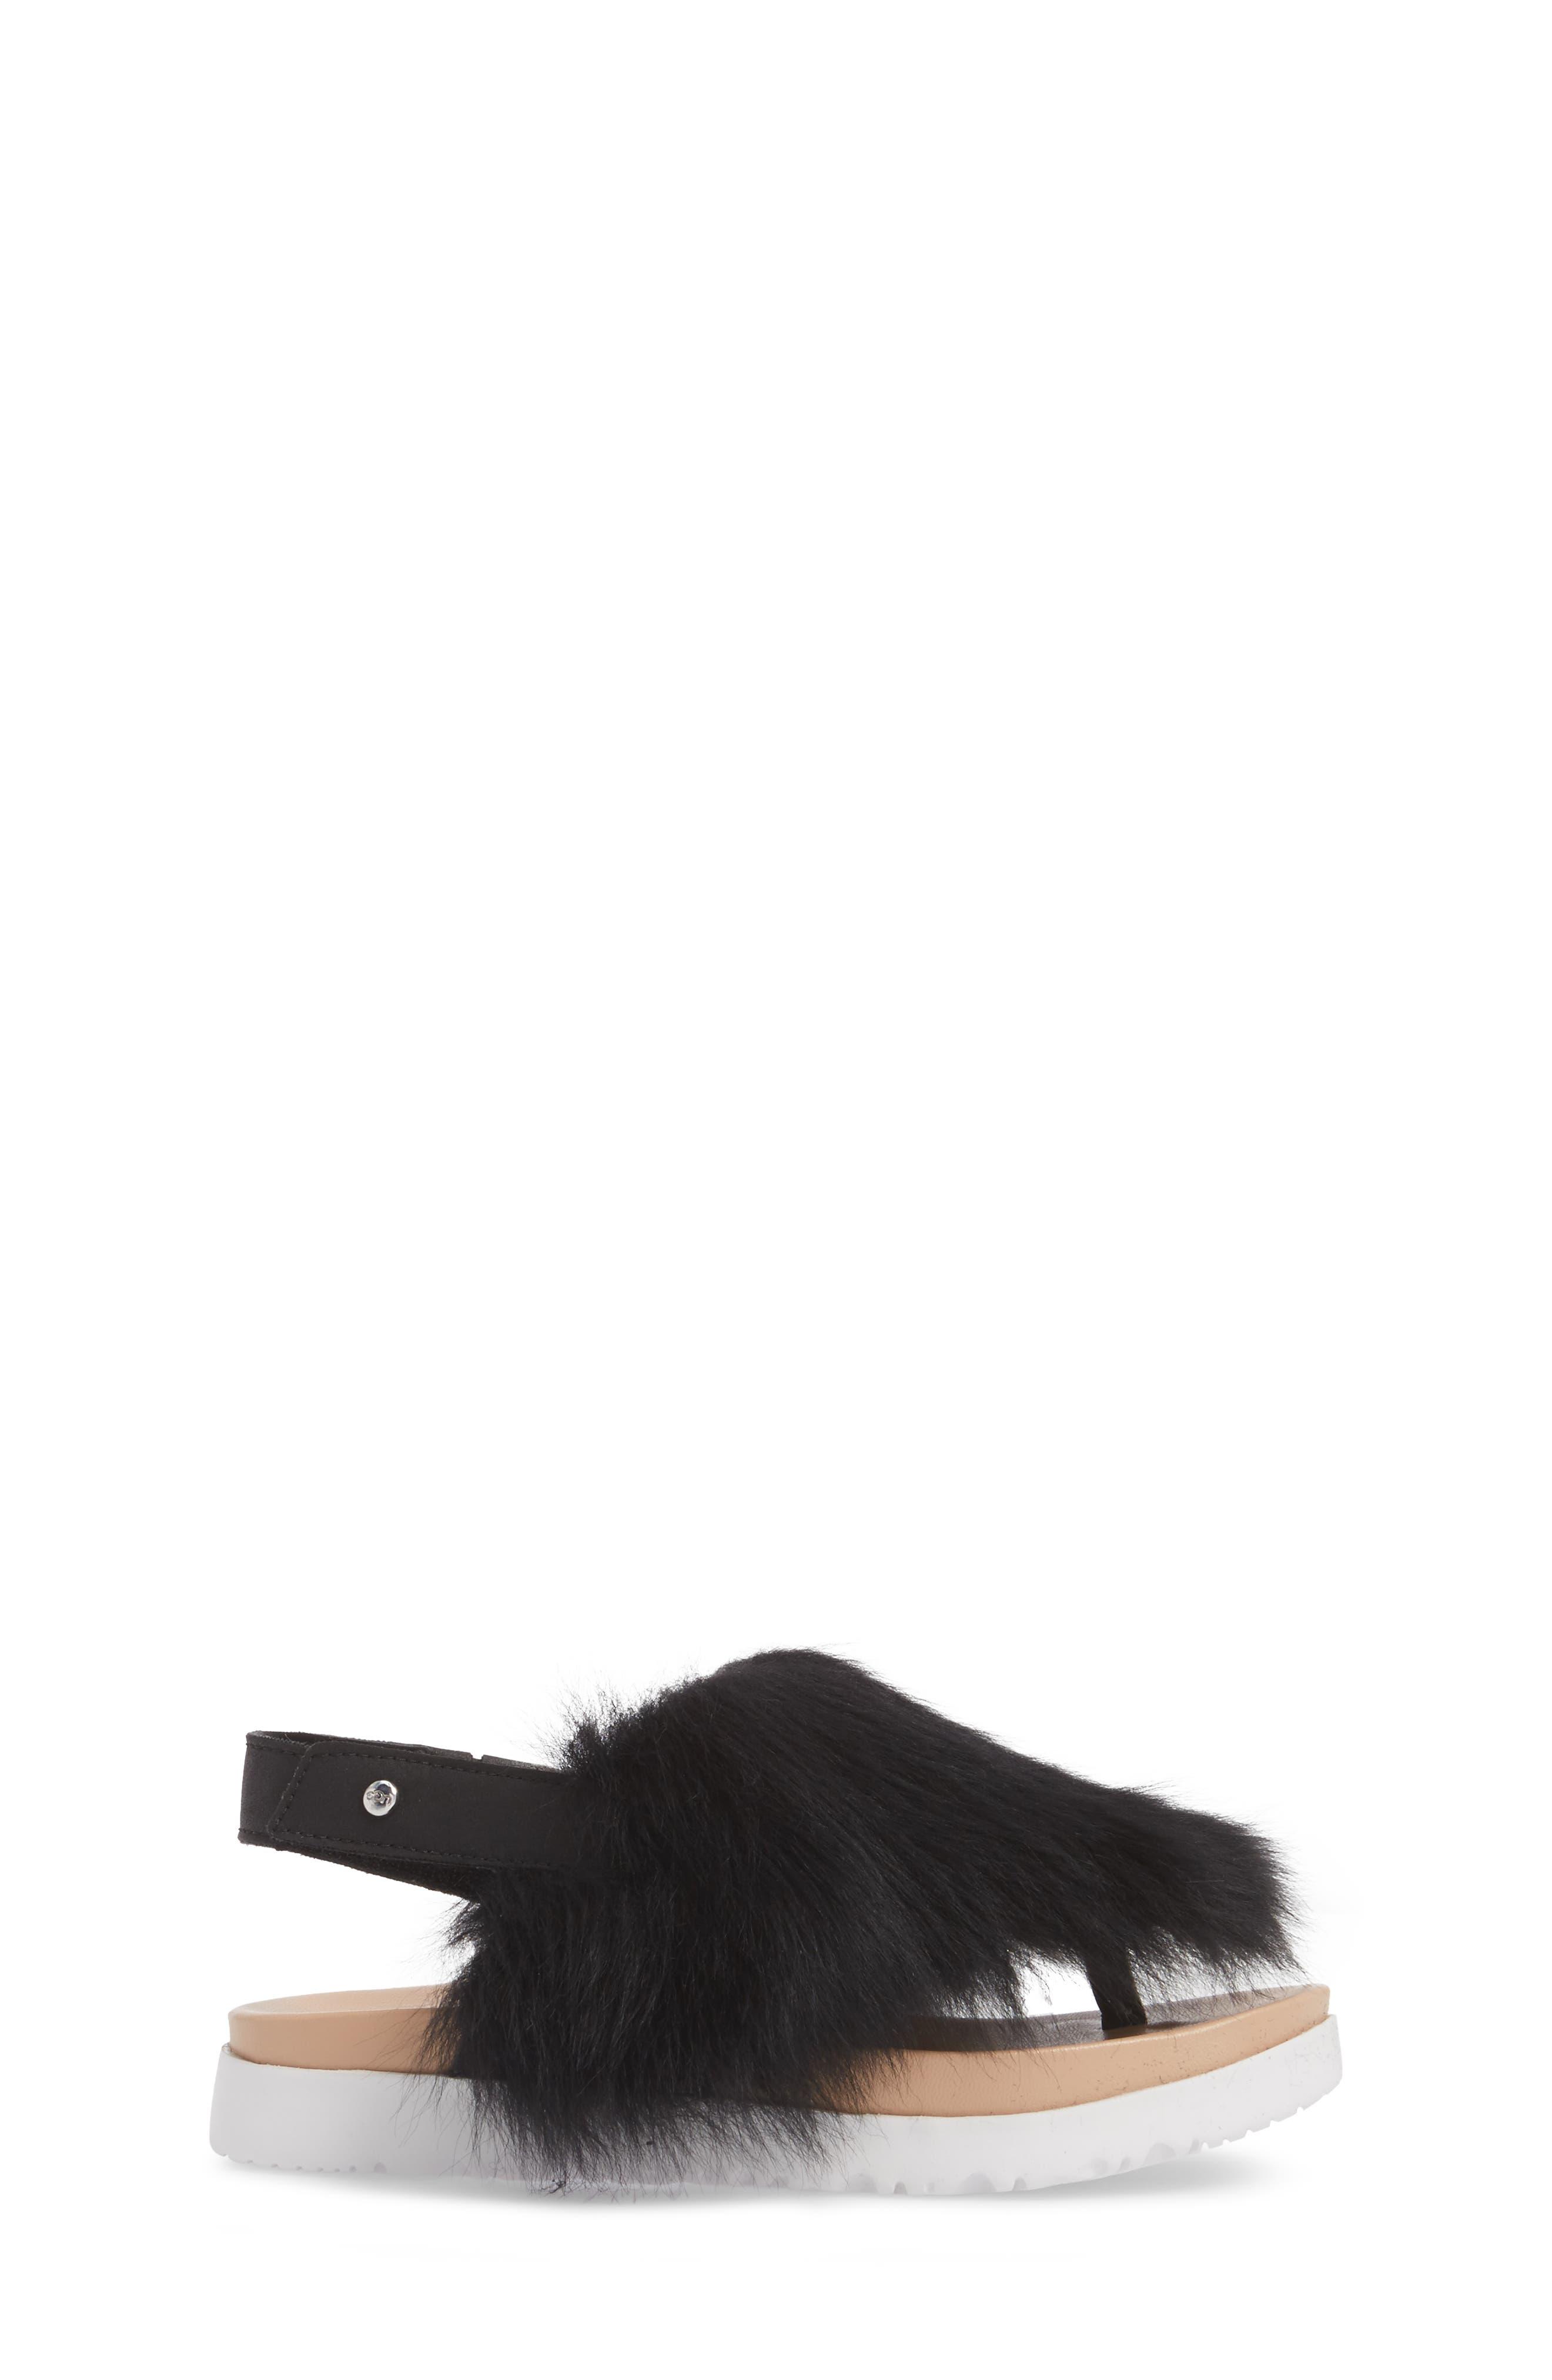 Holly Genuine Shearling Sandal,                             Alternate thumbnail 3, color,                             001